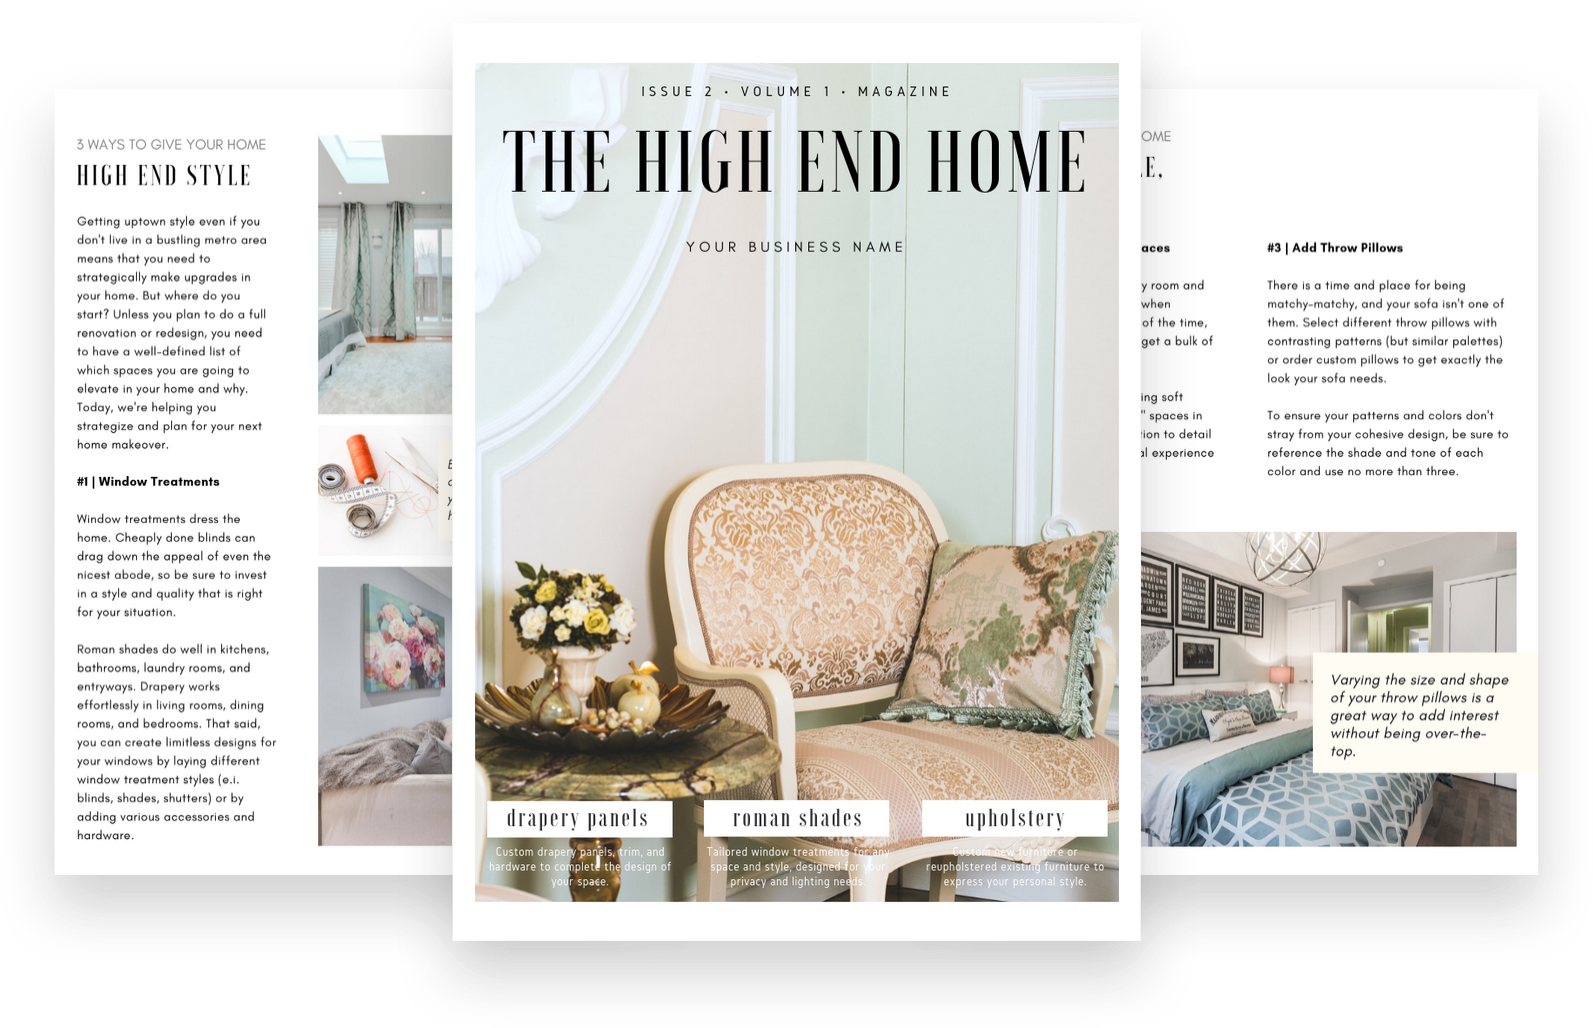 branded magazine ebook freebie lead magnet window workroom upholstery template marketing.png